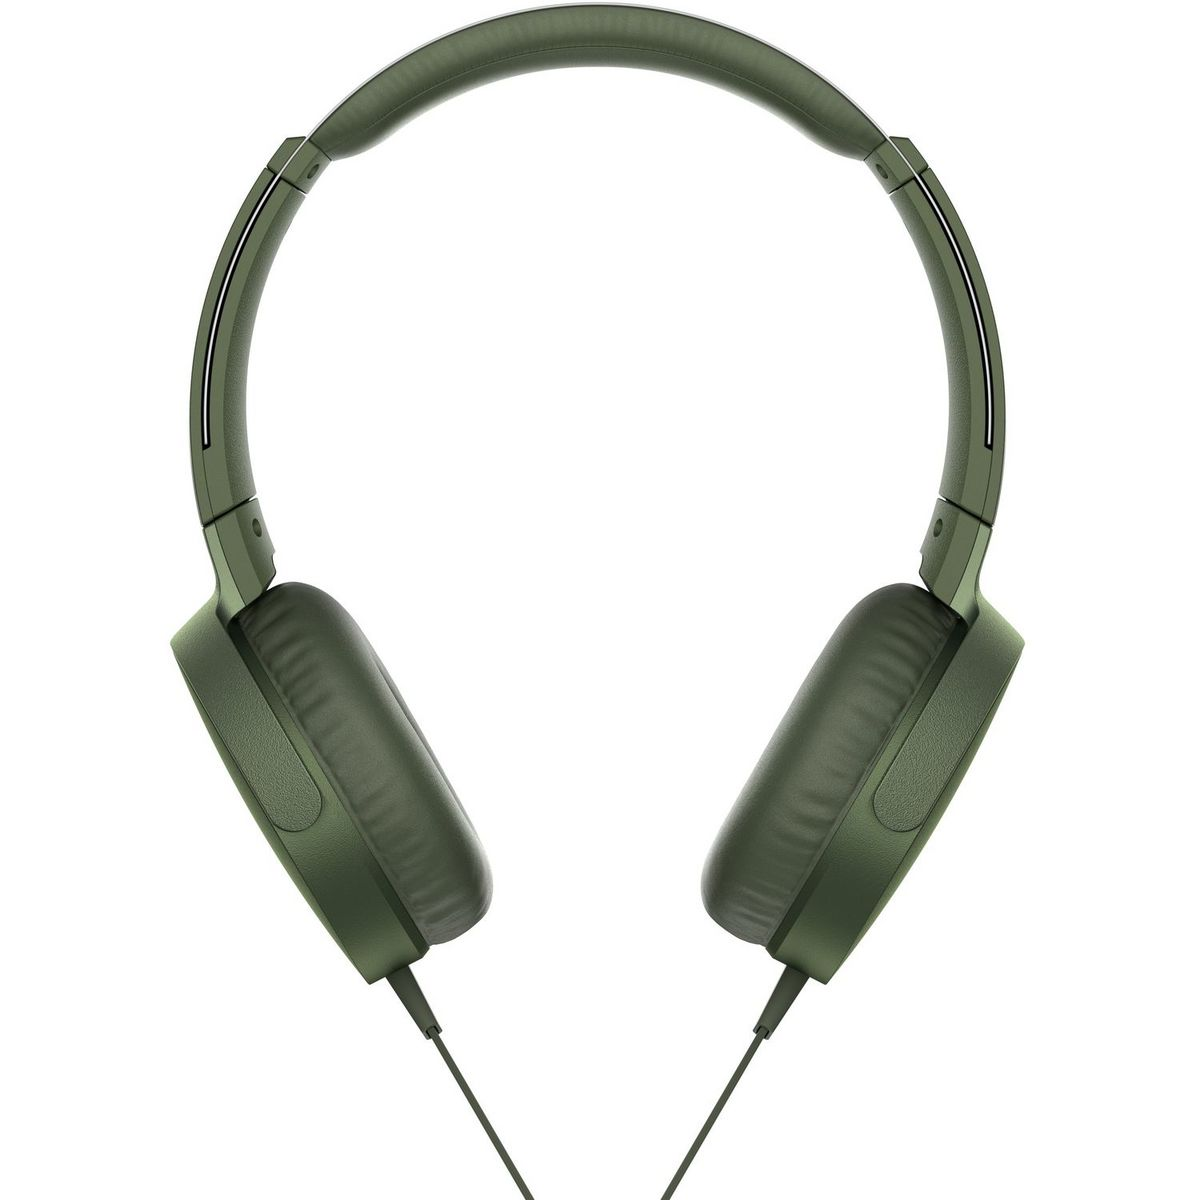 Casque Audio Extra Bass XB550 AP Jack Kaki